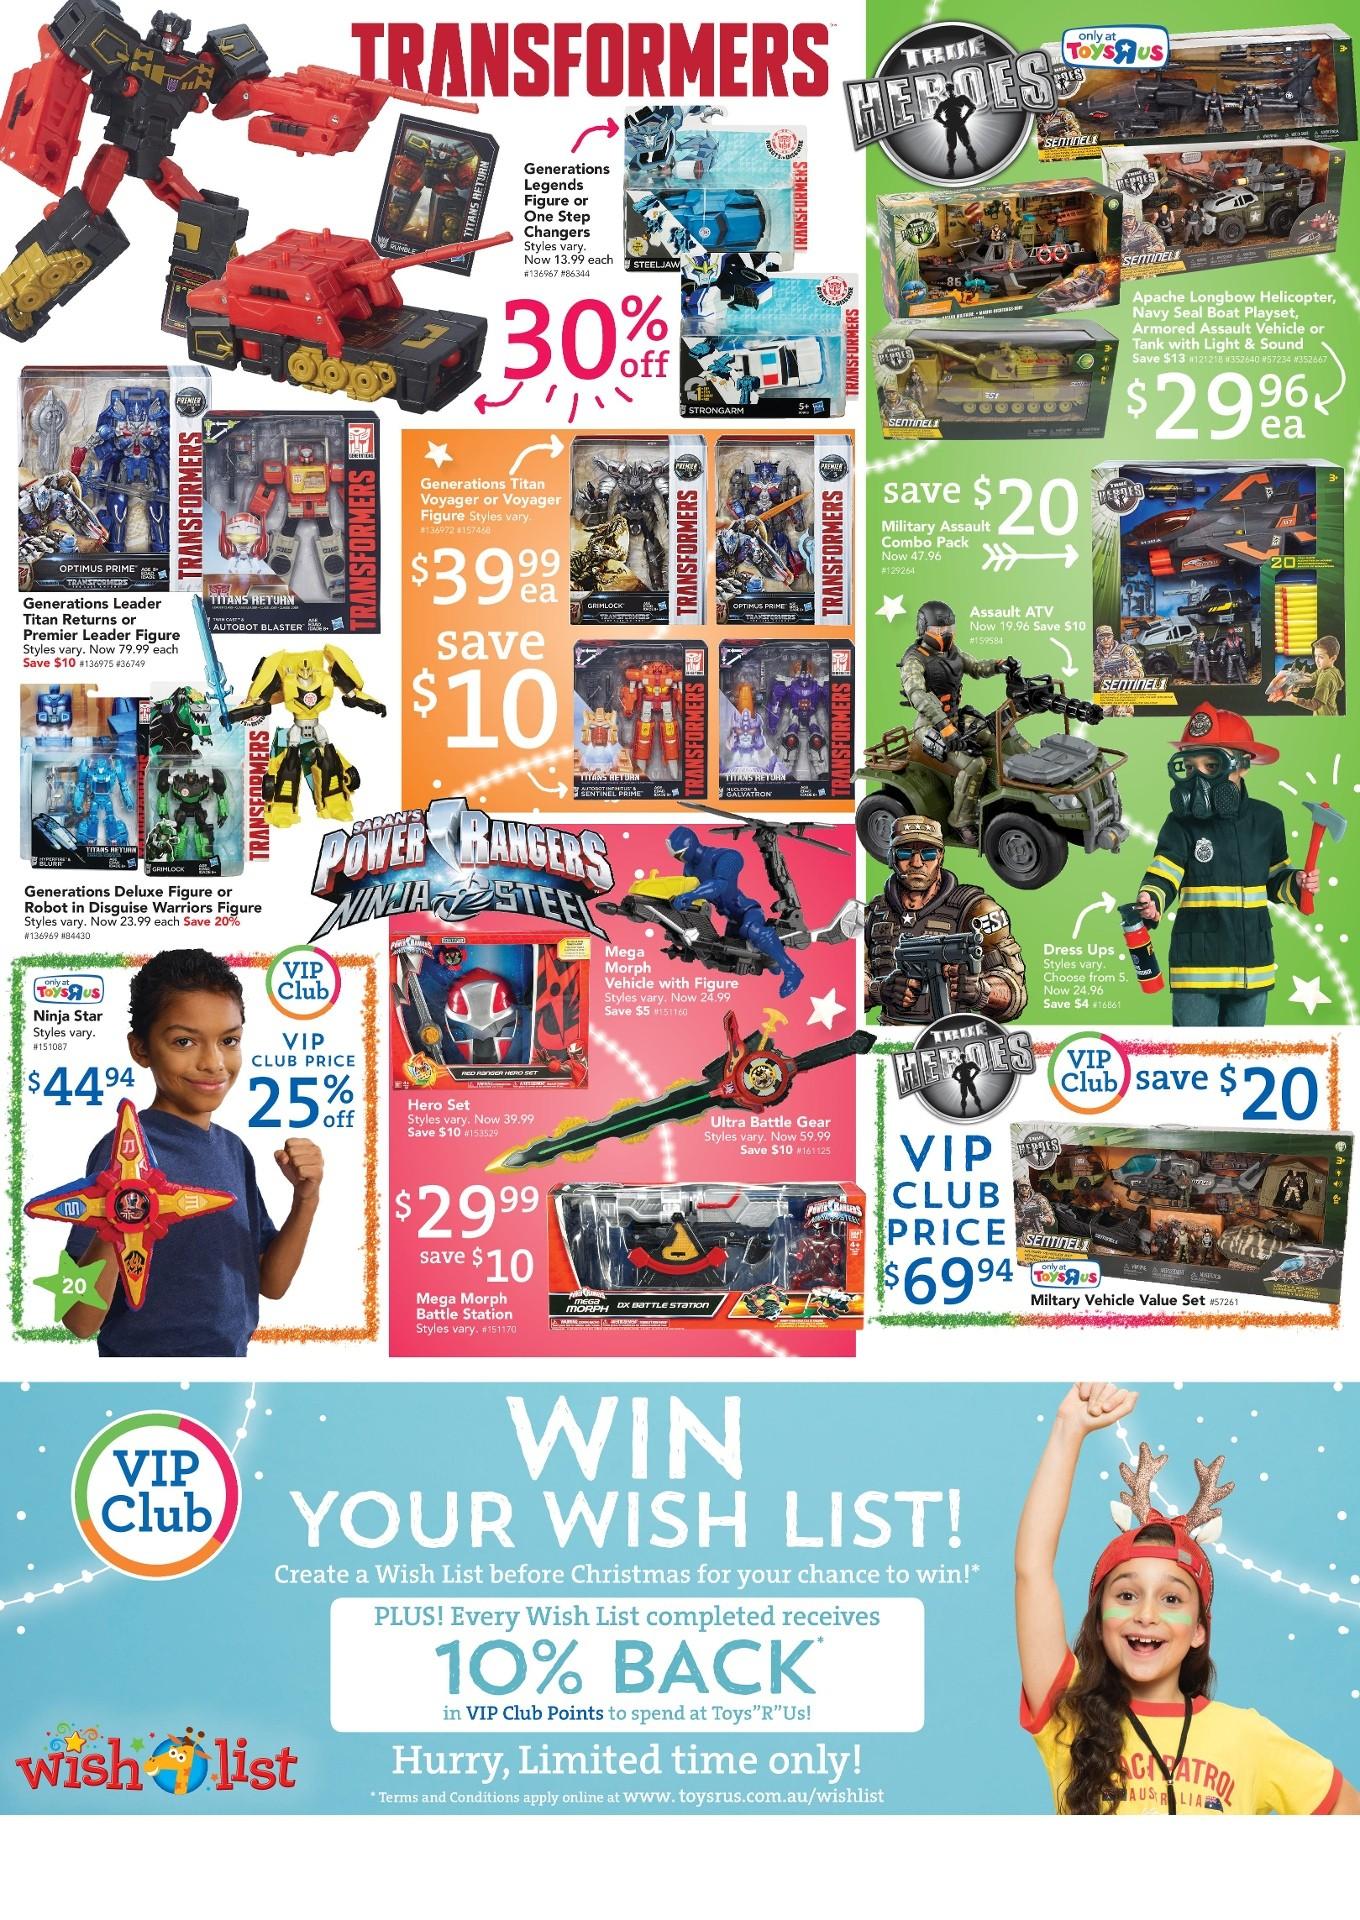 Transformers News: Australian Toys'R'Us Transformers Sales Starting Wednesday 29